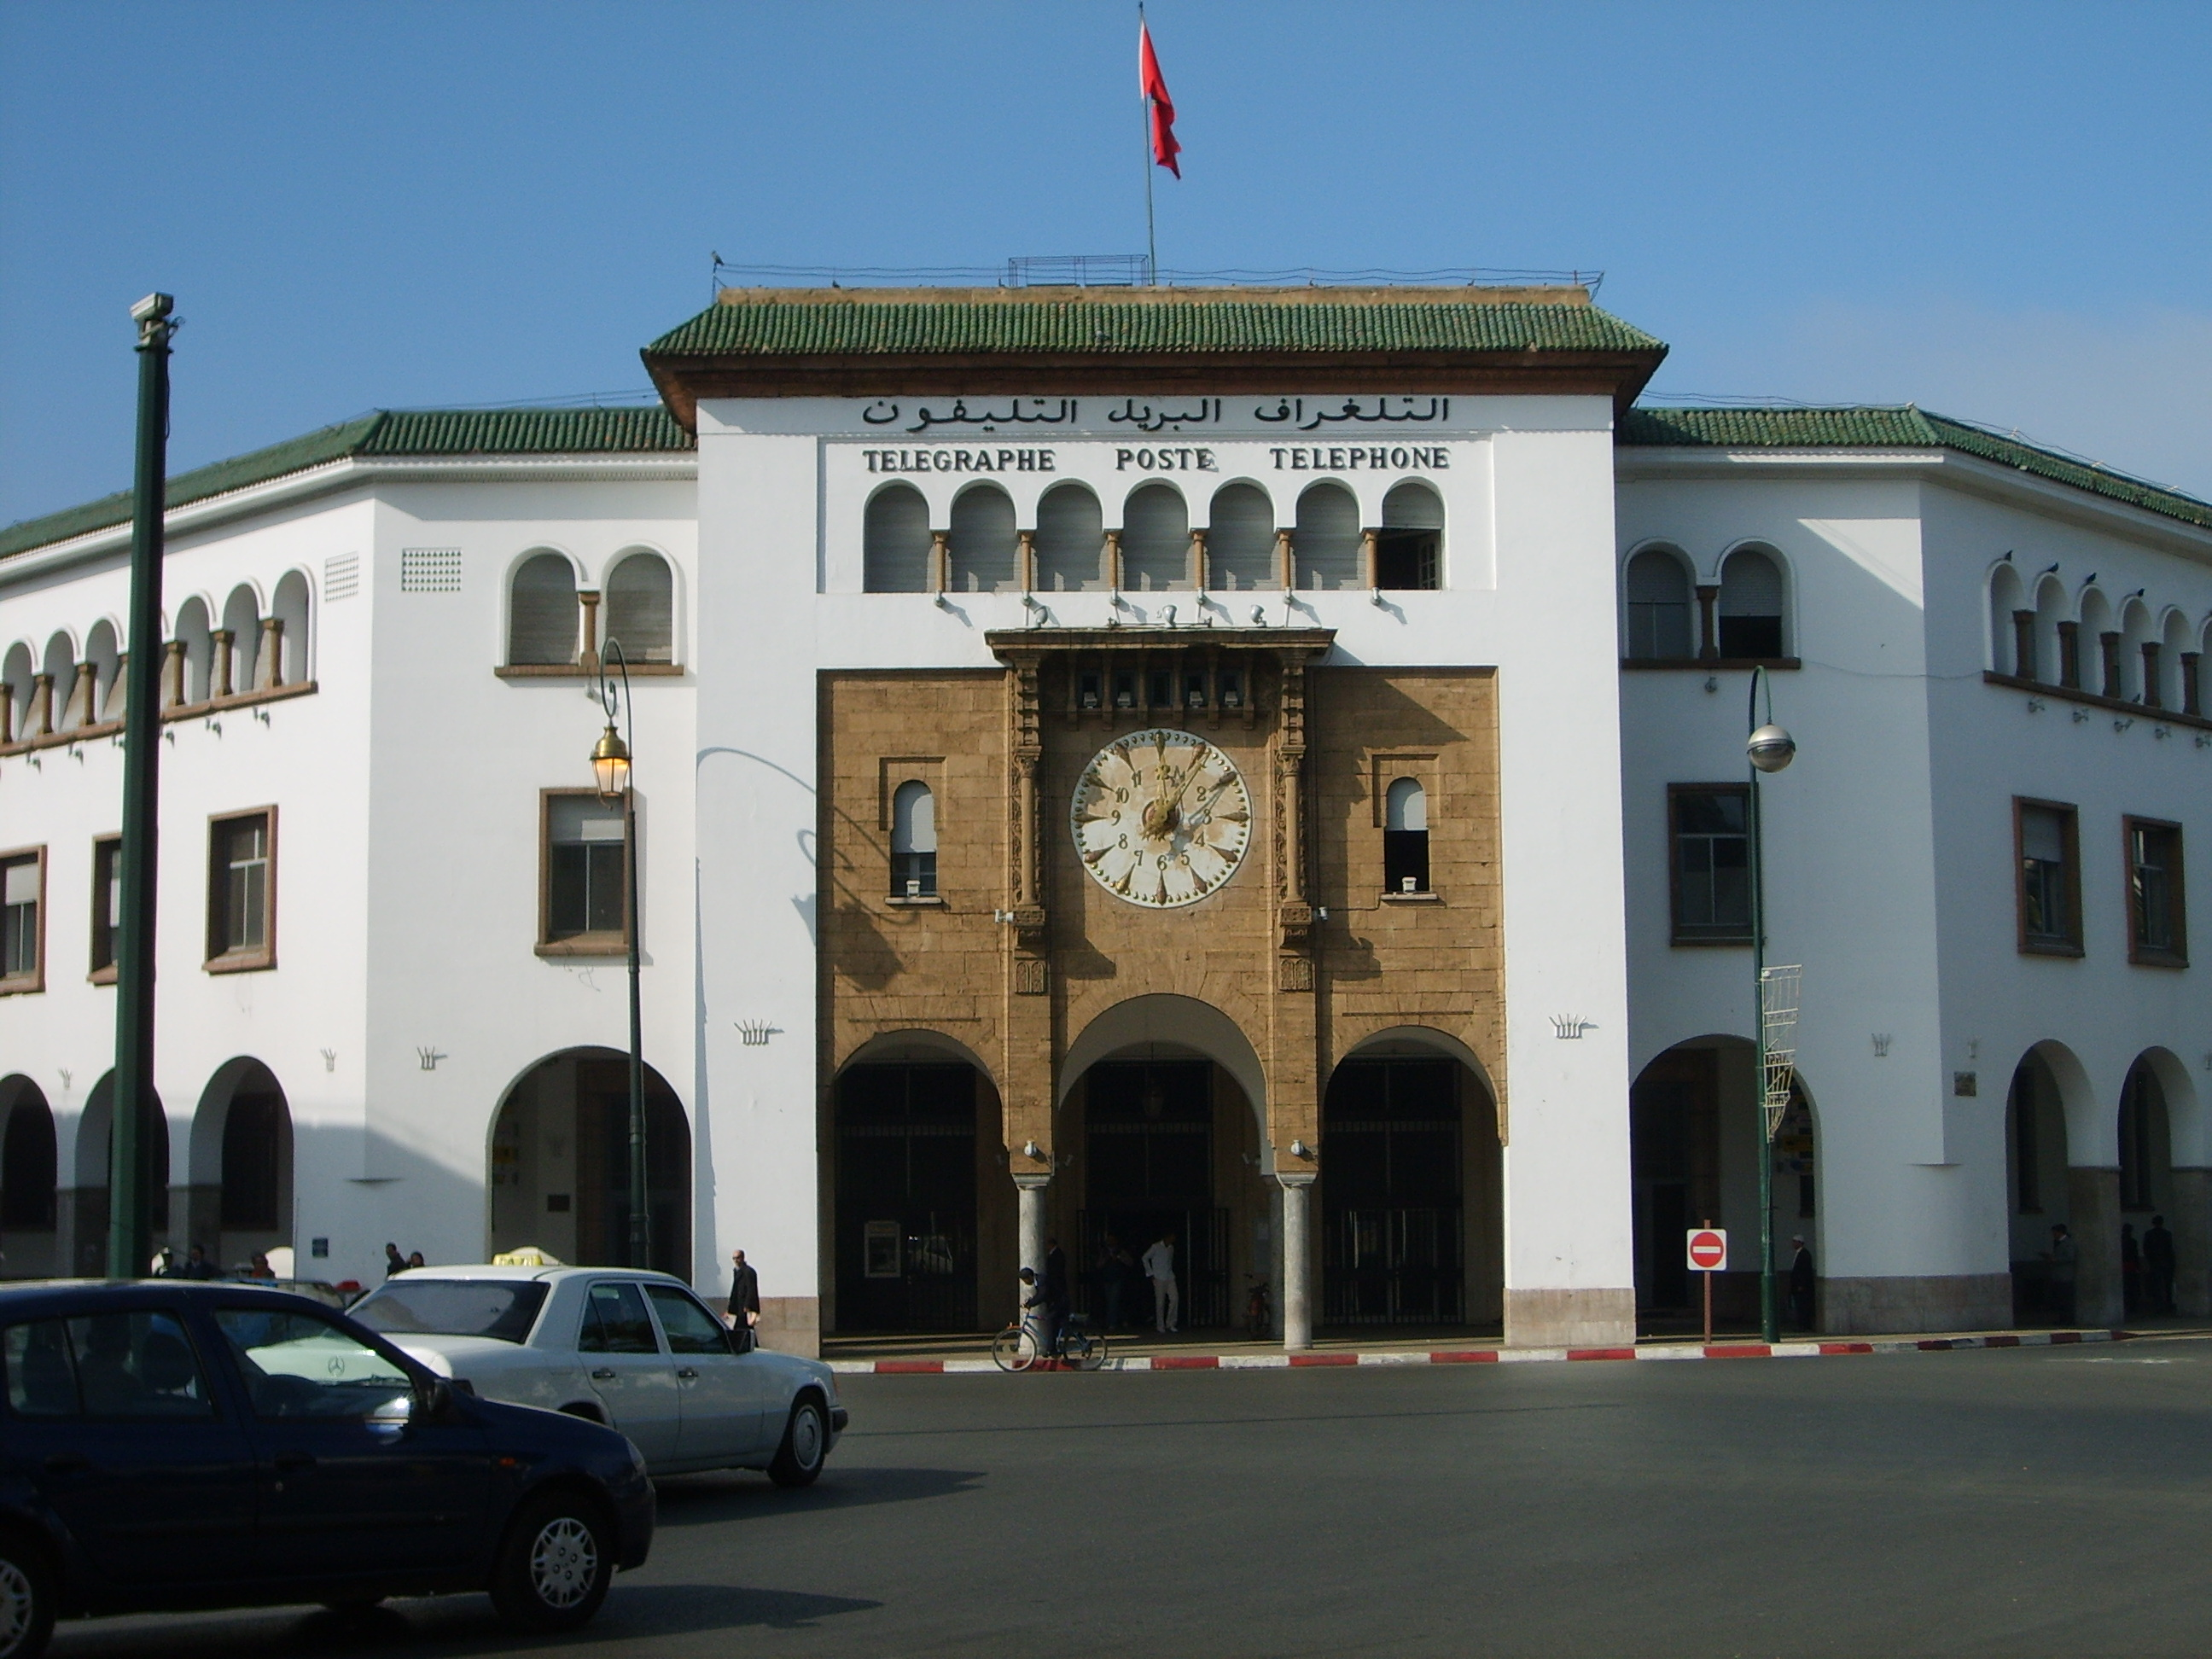 Classement des 10 plus vieux mus es au maroc welovebuzz for Mobilia hay riad rabat